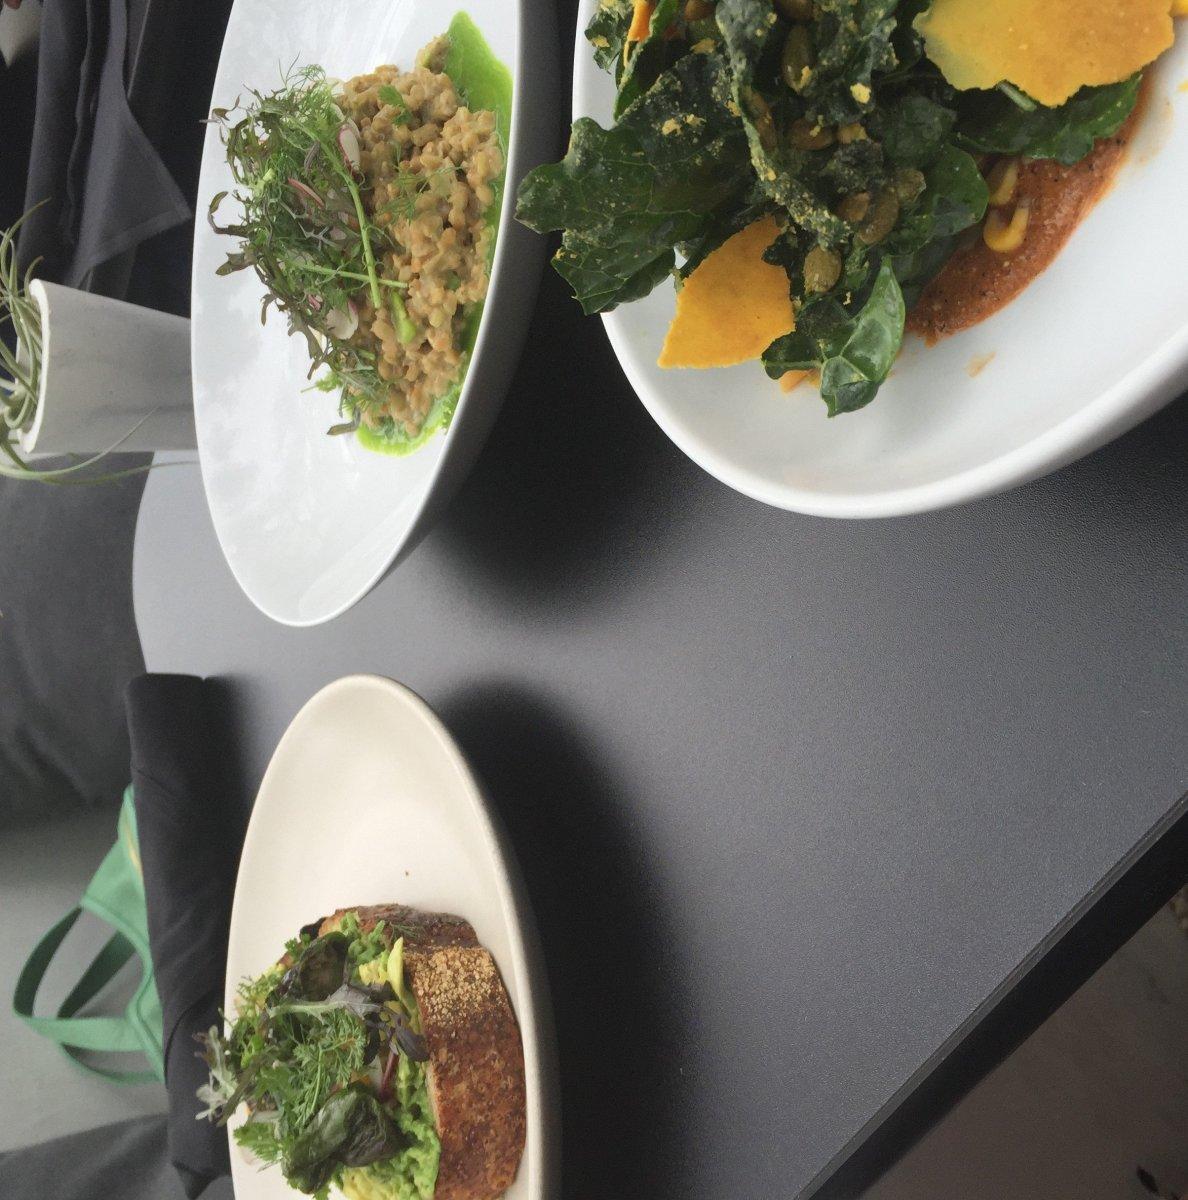 Is Vegan Food Getting Too Fancy? Matthew Kenney Doesn't Think So